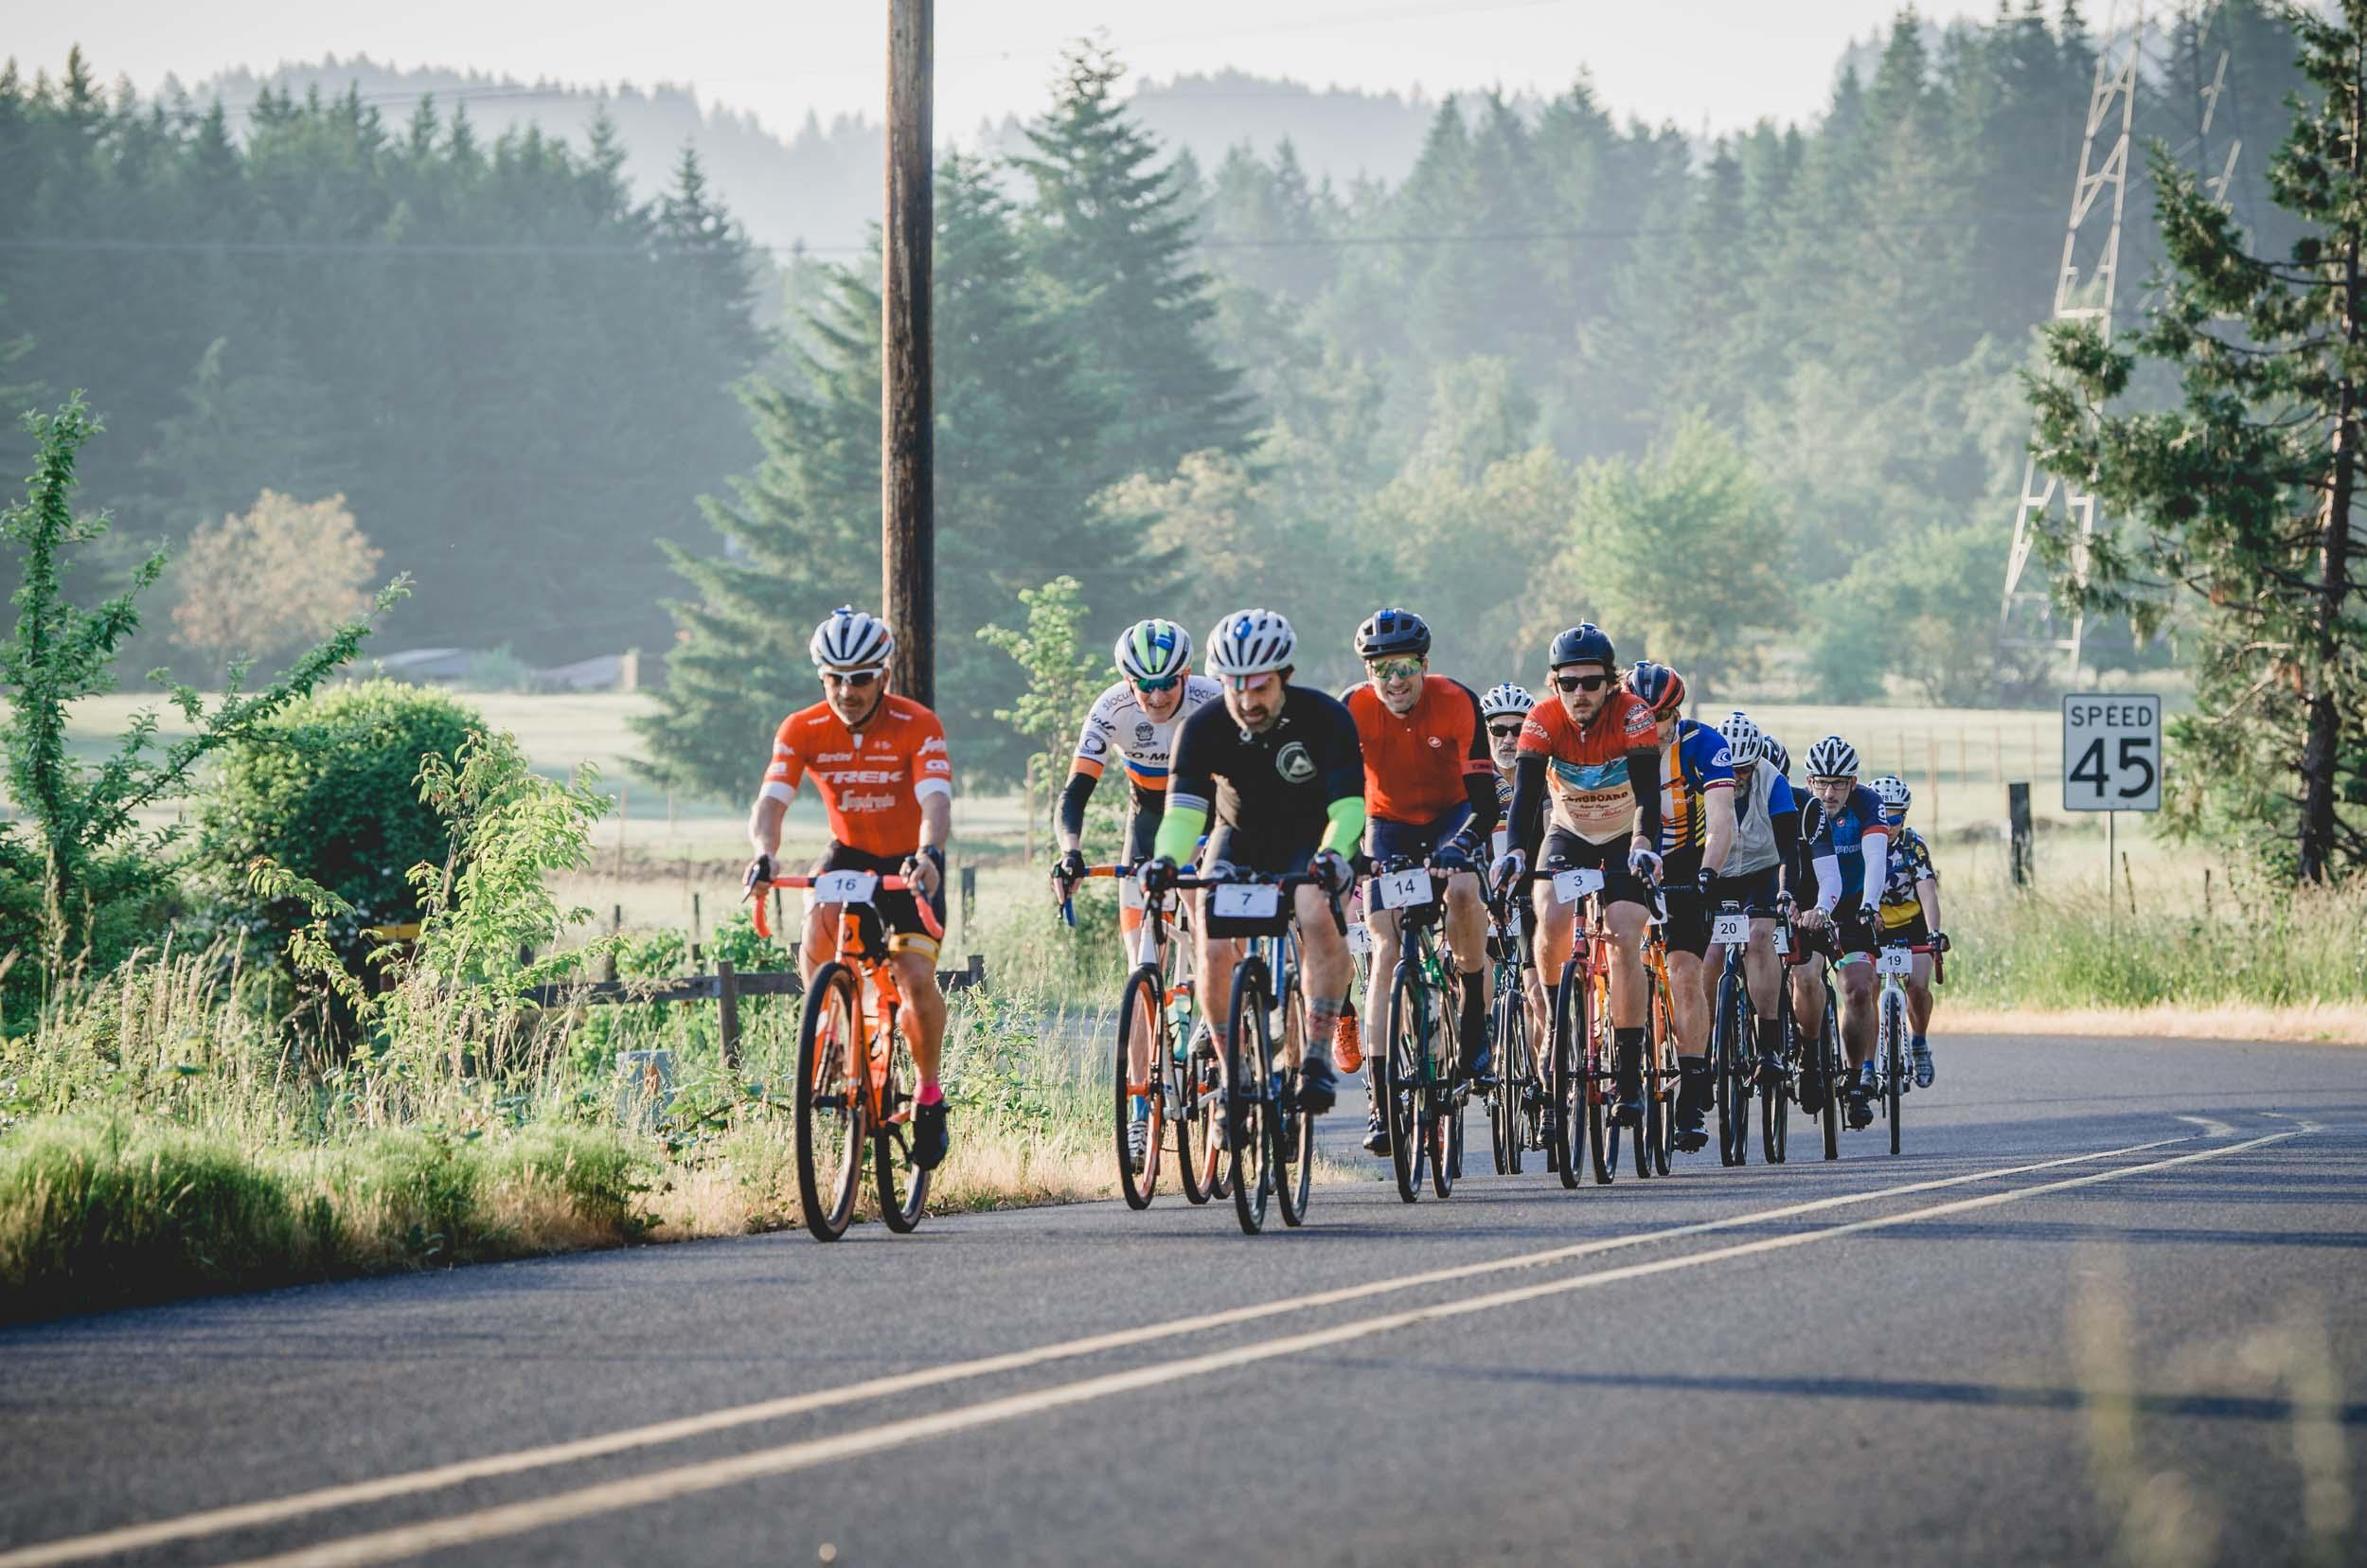 Pleasant Cottage Grove Rolls Out Welcome For Oregon Gran Fondo Bikeportland Org Interior Design Ideas Gentotryabchikinfo